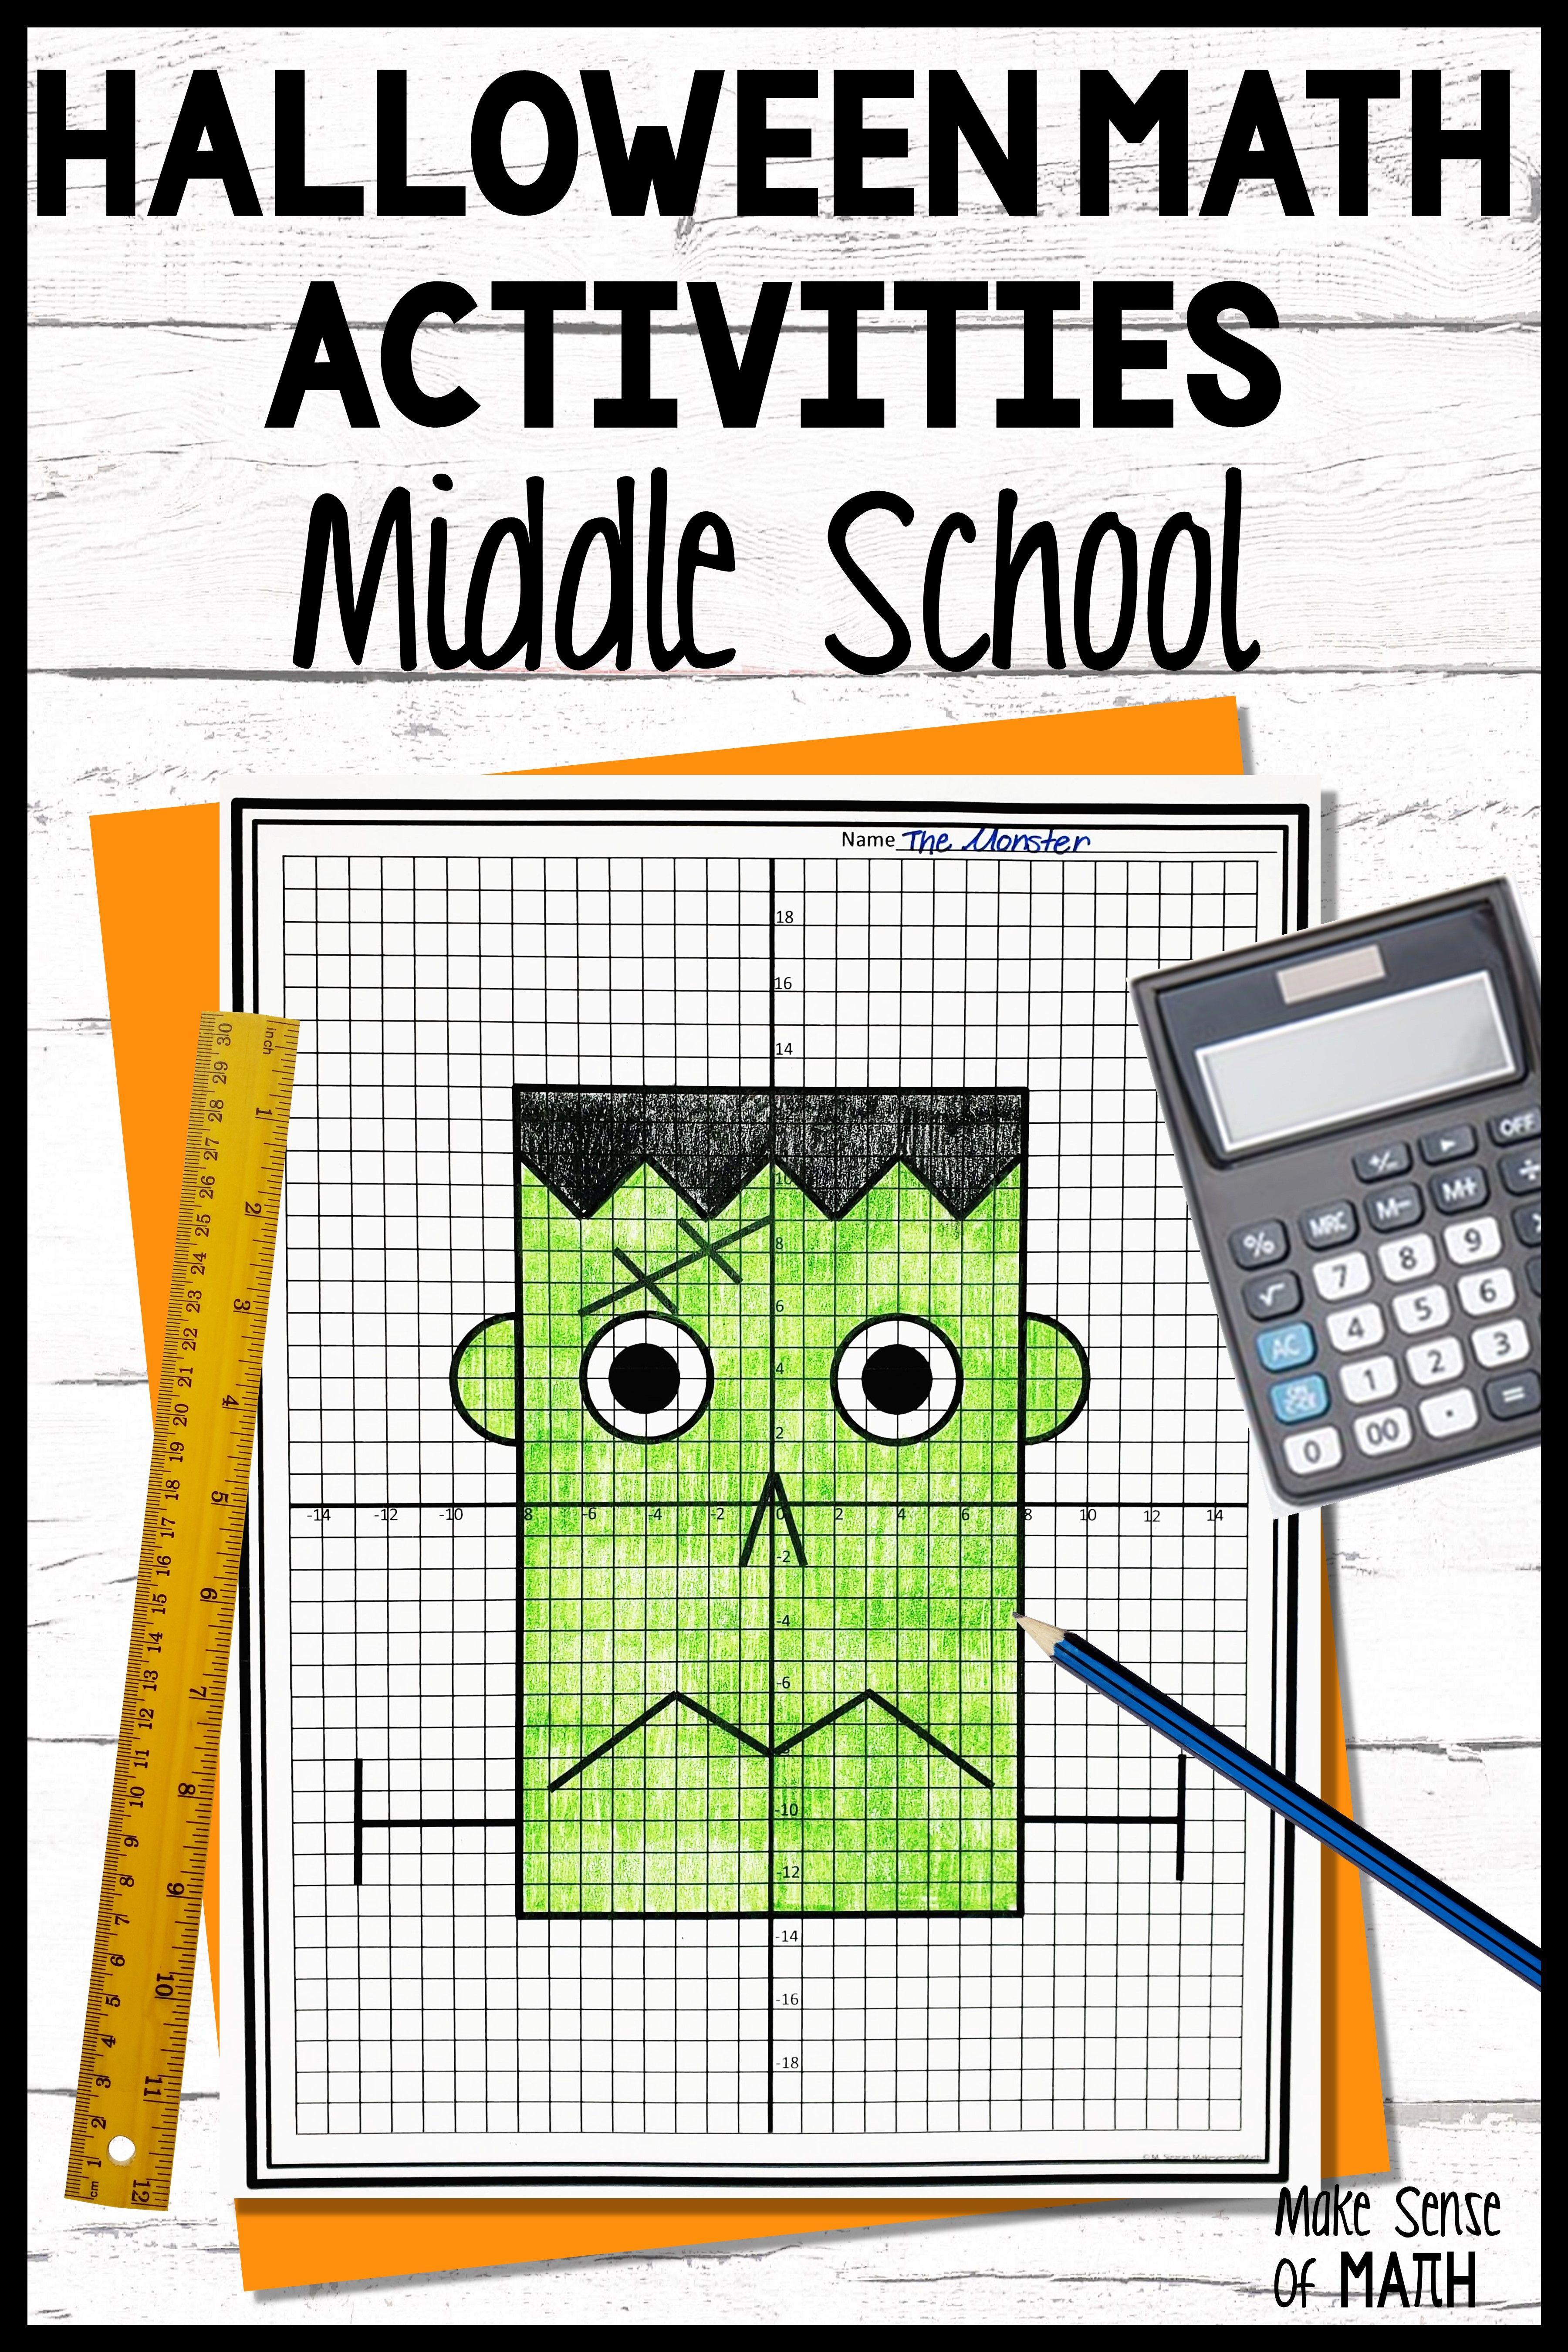 medium resolution of Halloween Math Activities and Worksheets for Middle School Math   Halloween  math activities